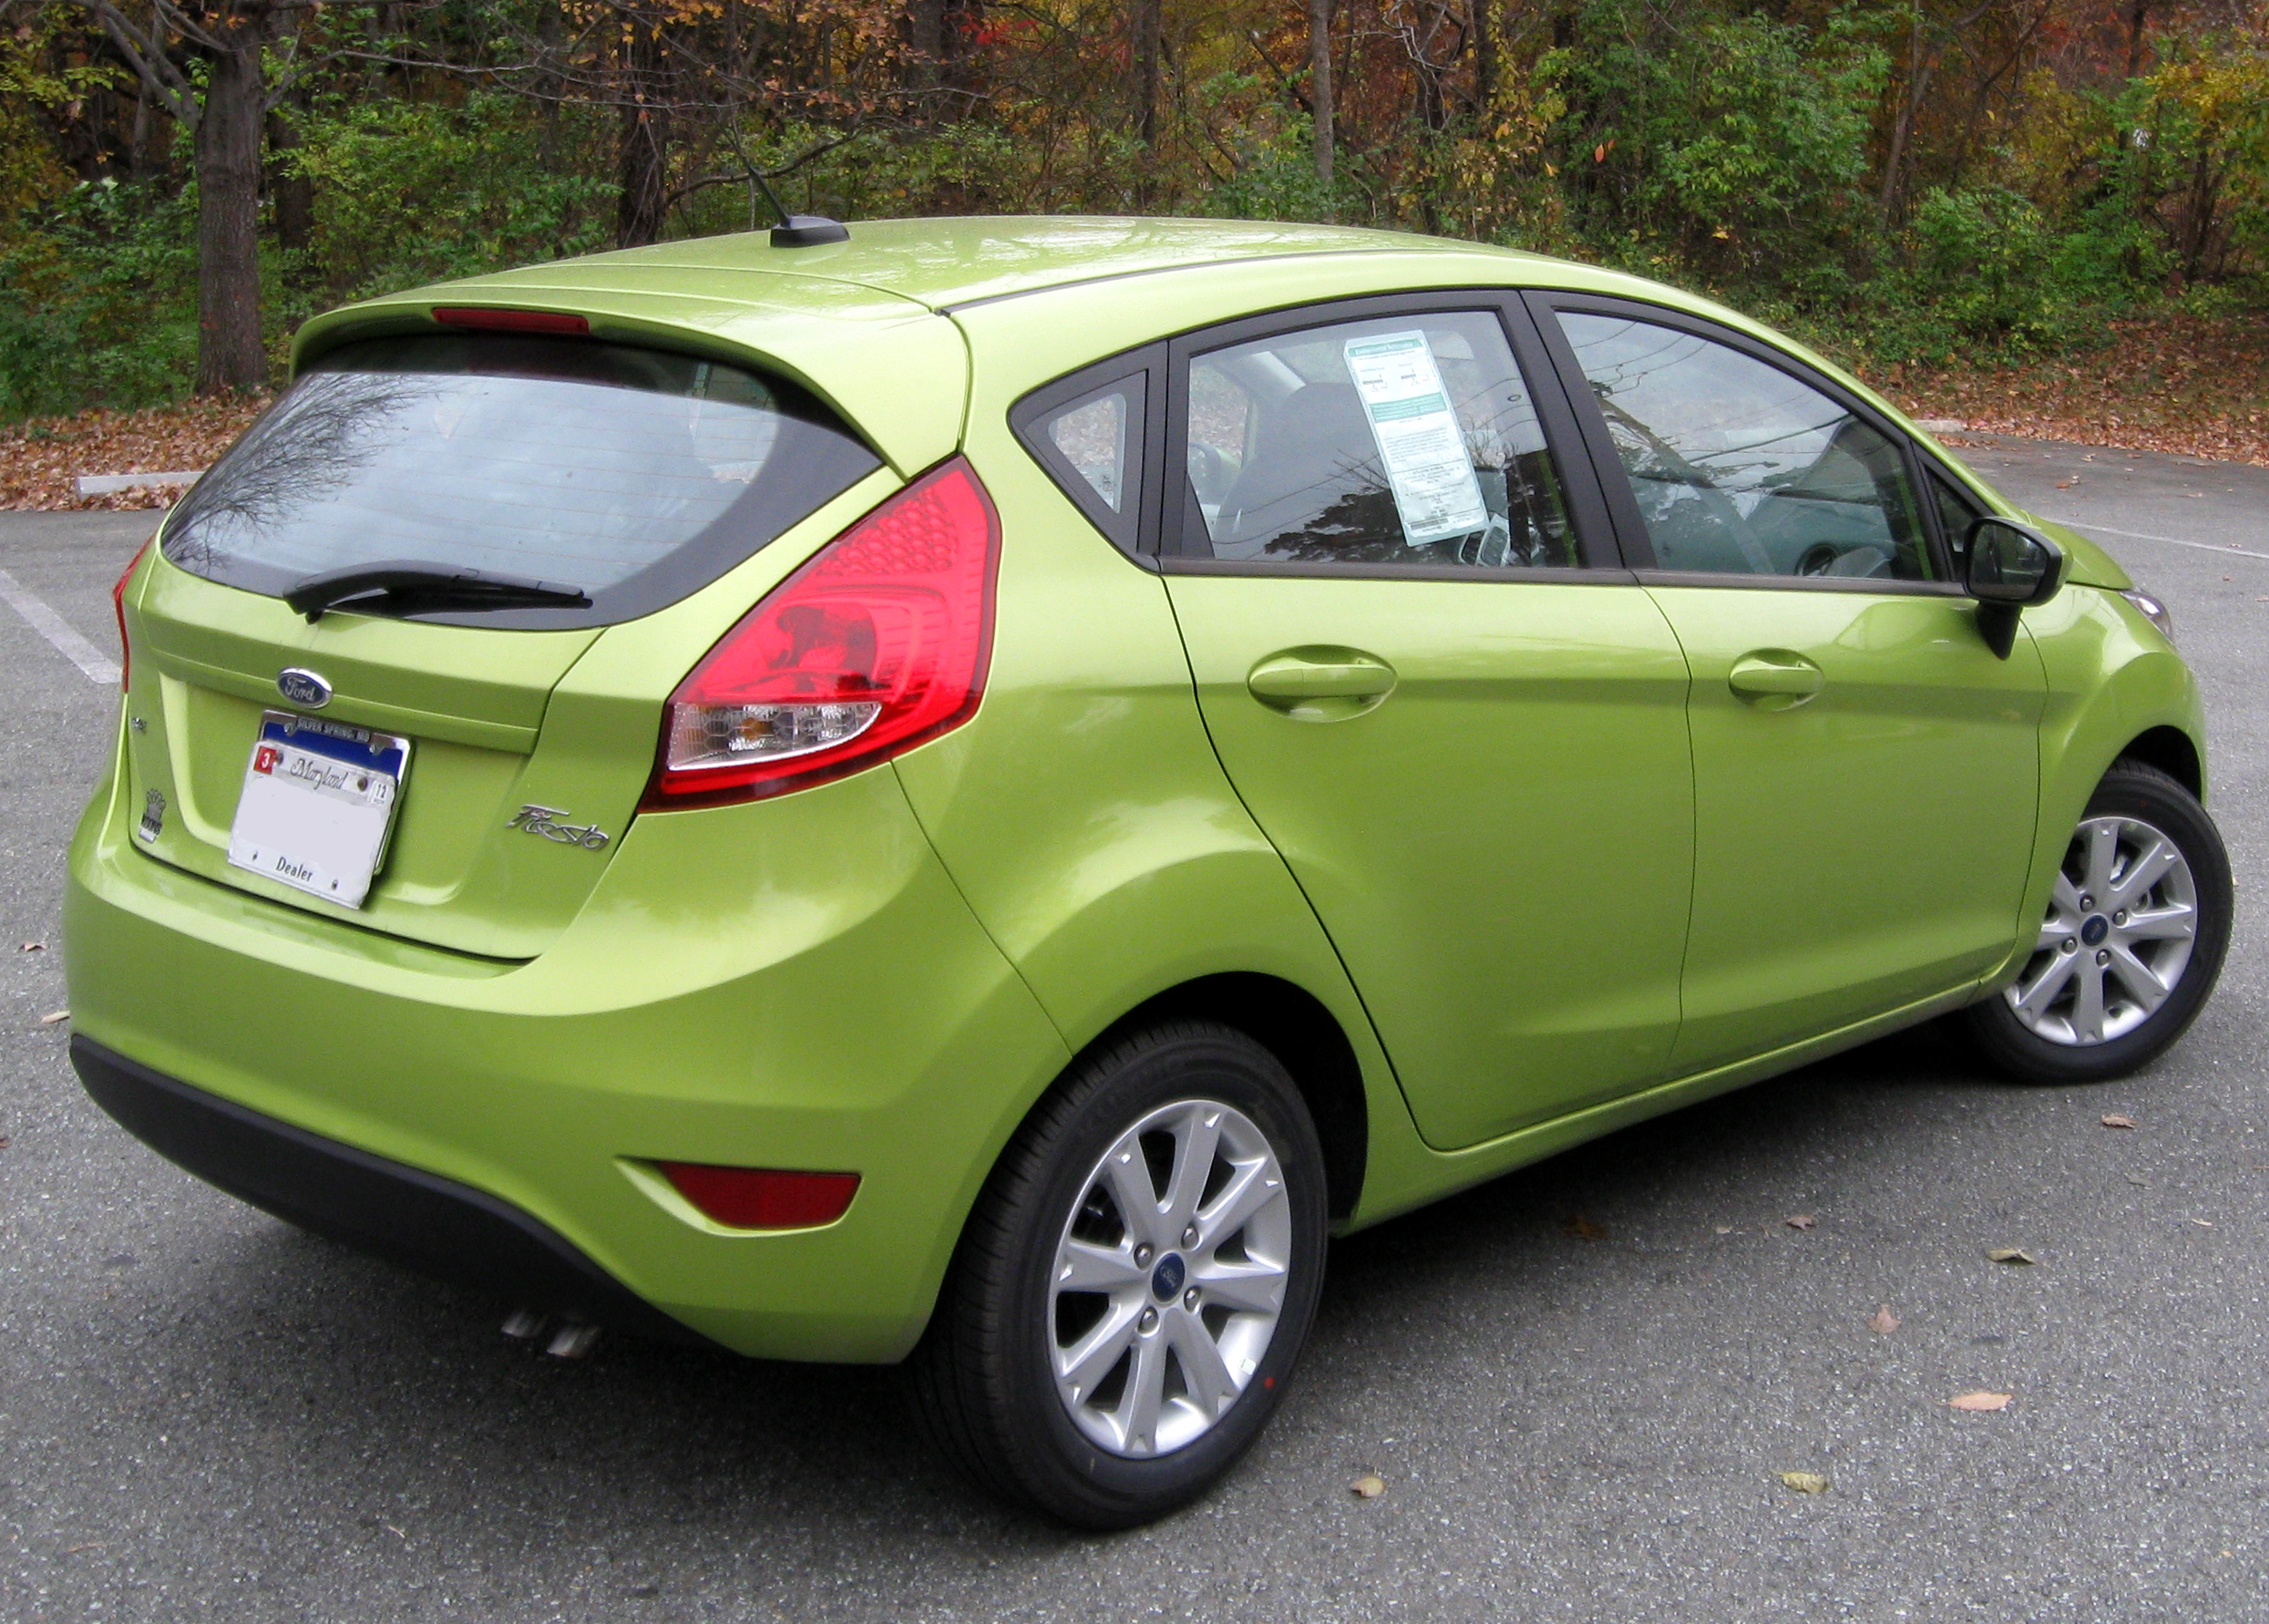 Ford Festiva Picture 2012 Fiesta SE Hatch 11 1